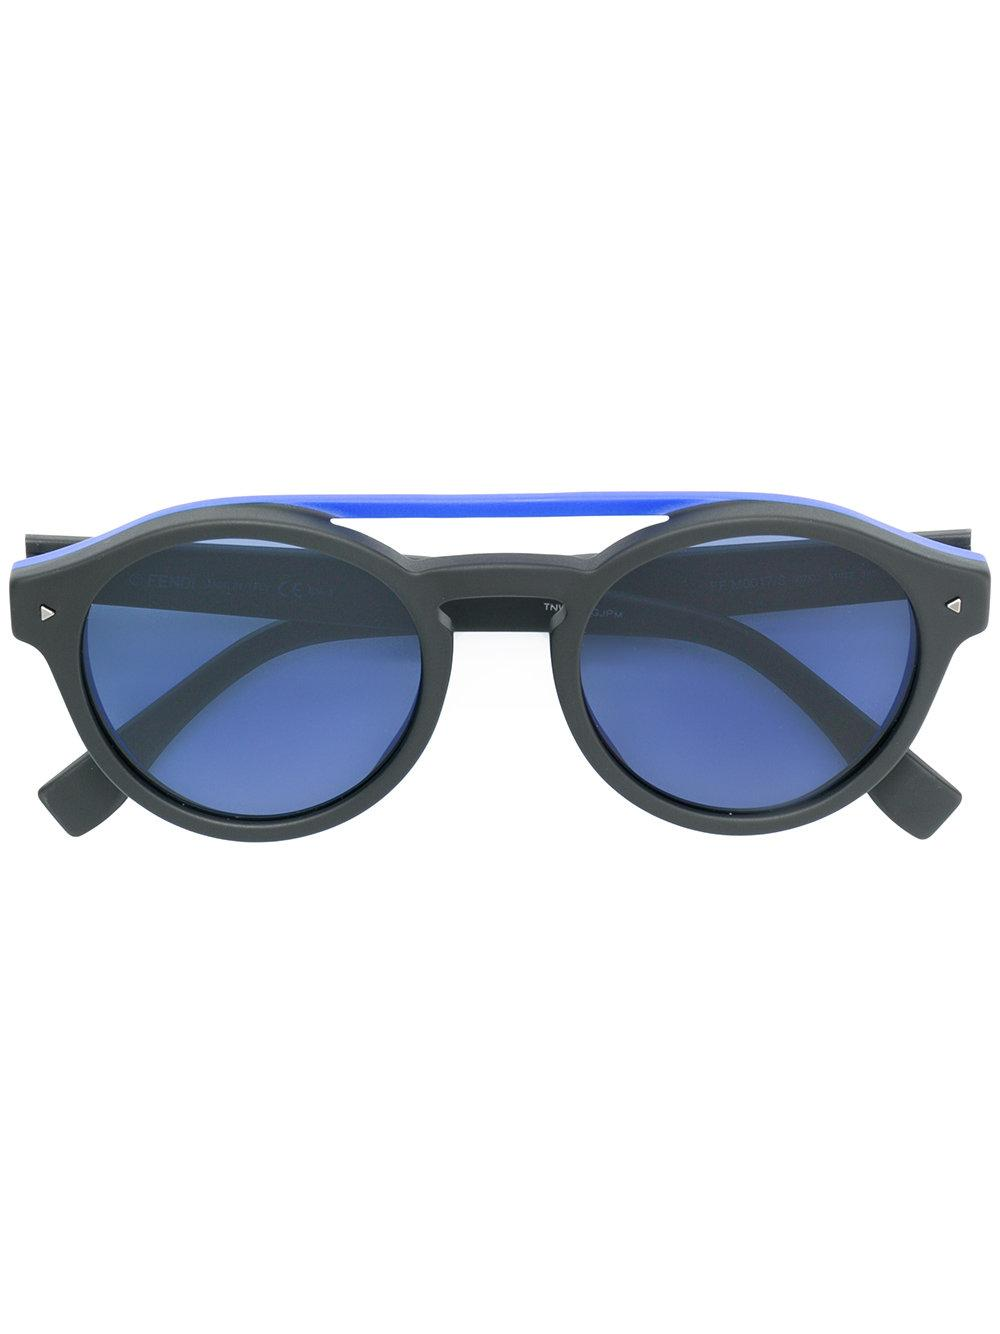 497b0410291 Fendi Eyewear Tinted Round Sunglasses - Grey